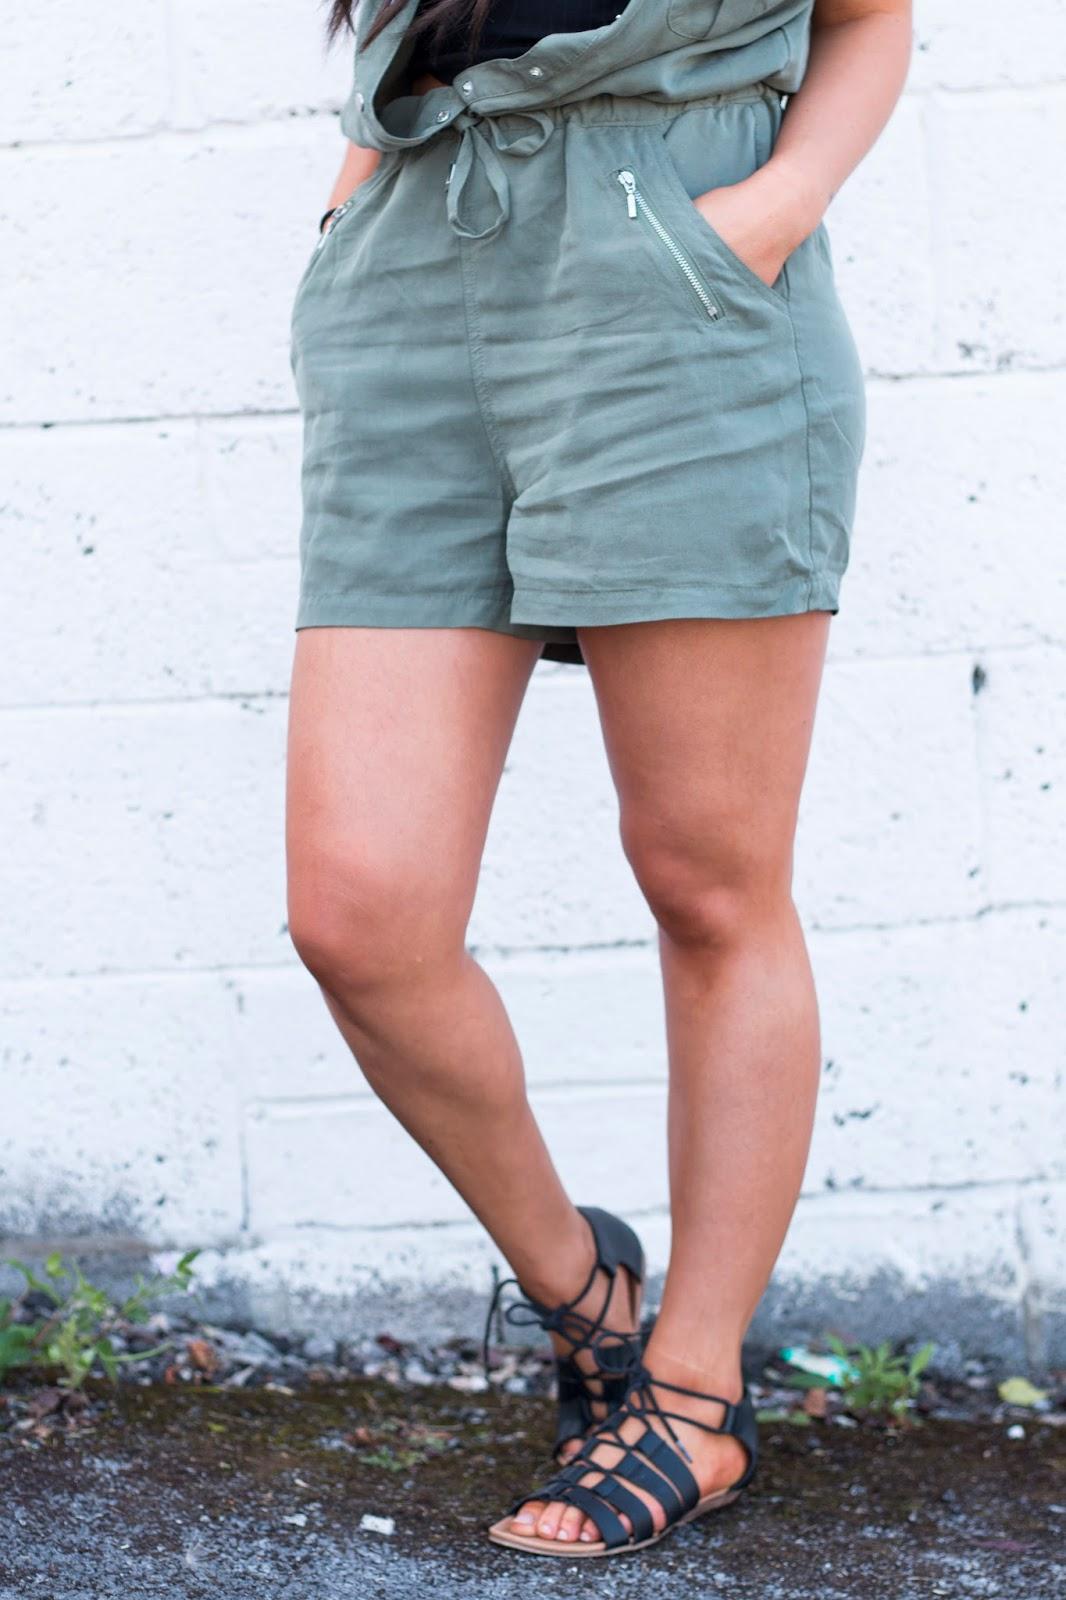 OOTD Summer Outfit Khacki Playsuit Statement Necklace Kayley Anne Jones